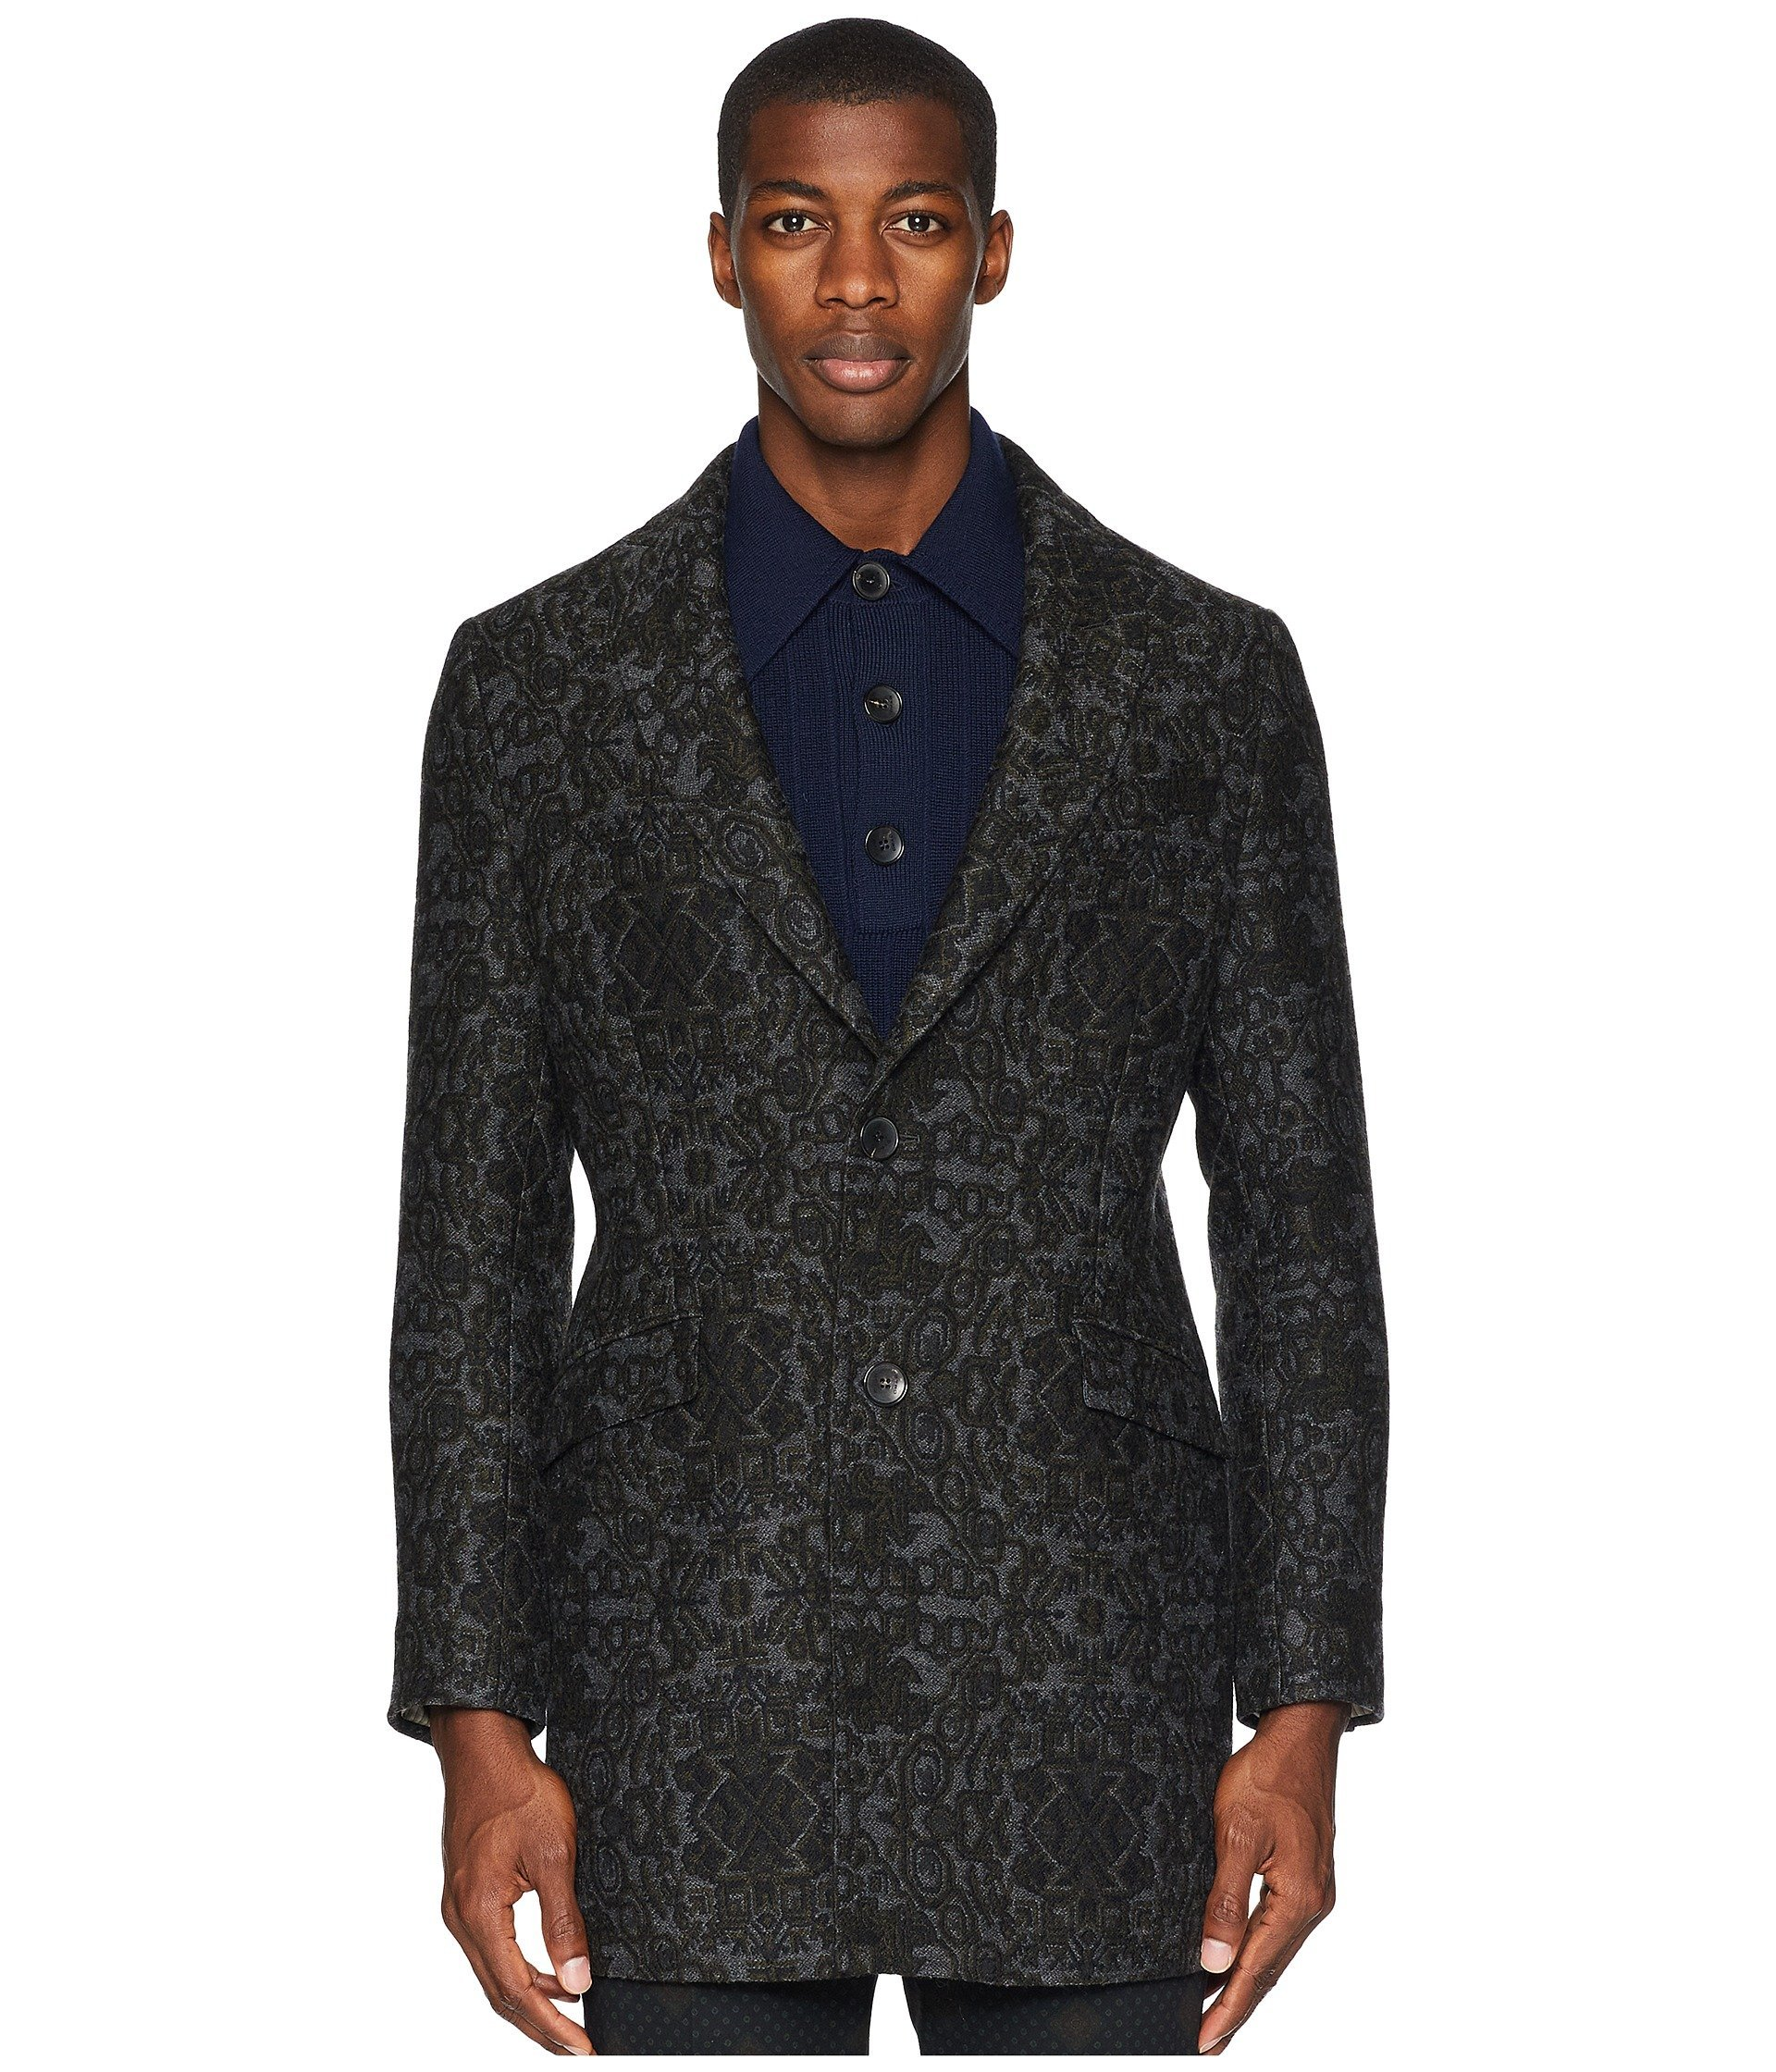 Etro Etro Brocade Brocade Grey Overcoat Ydw7nRq